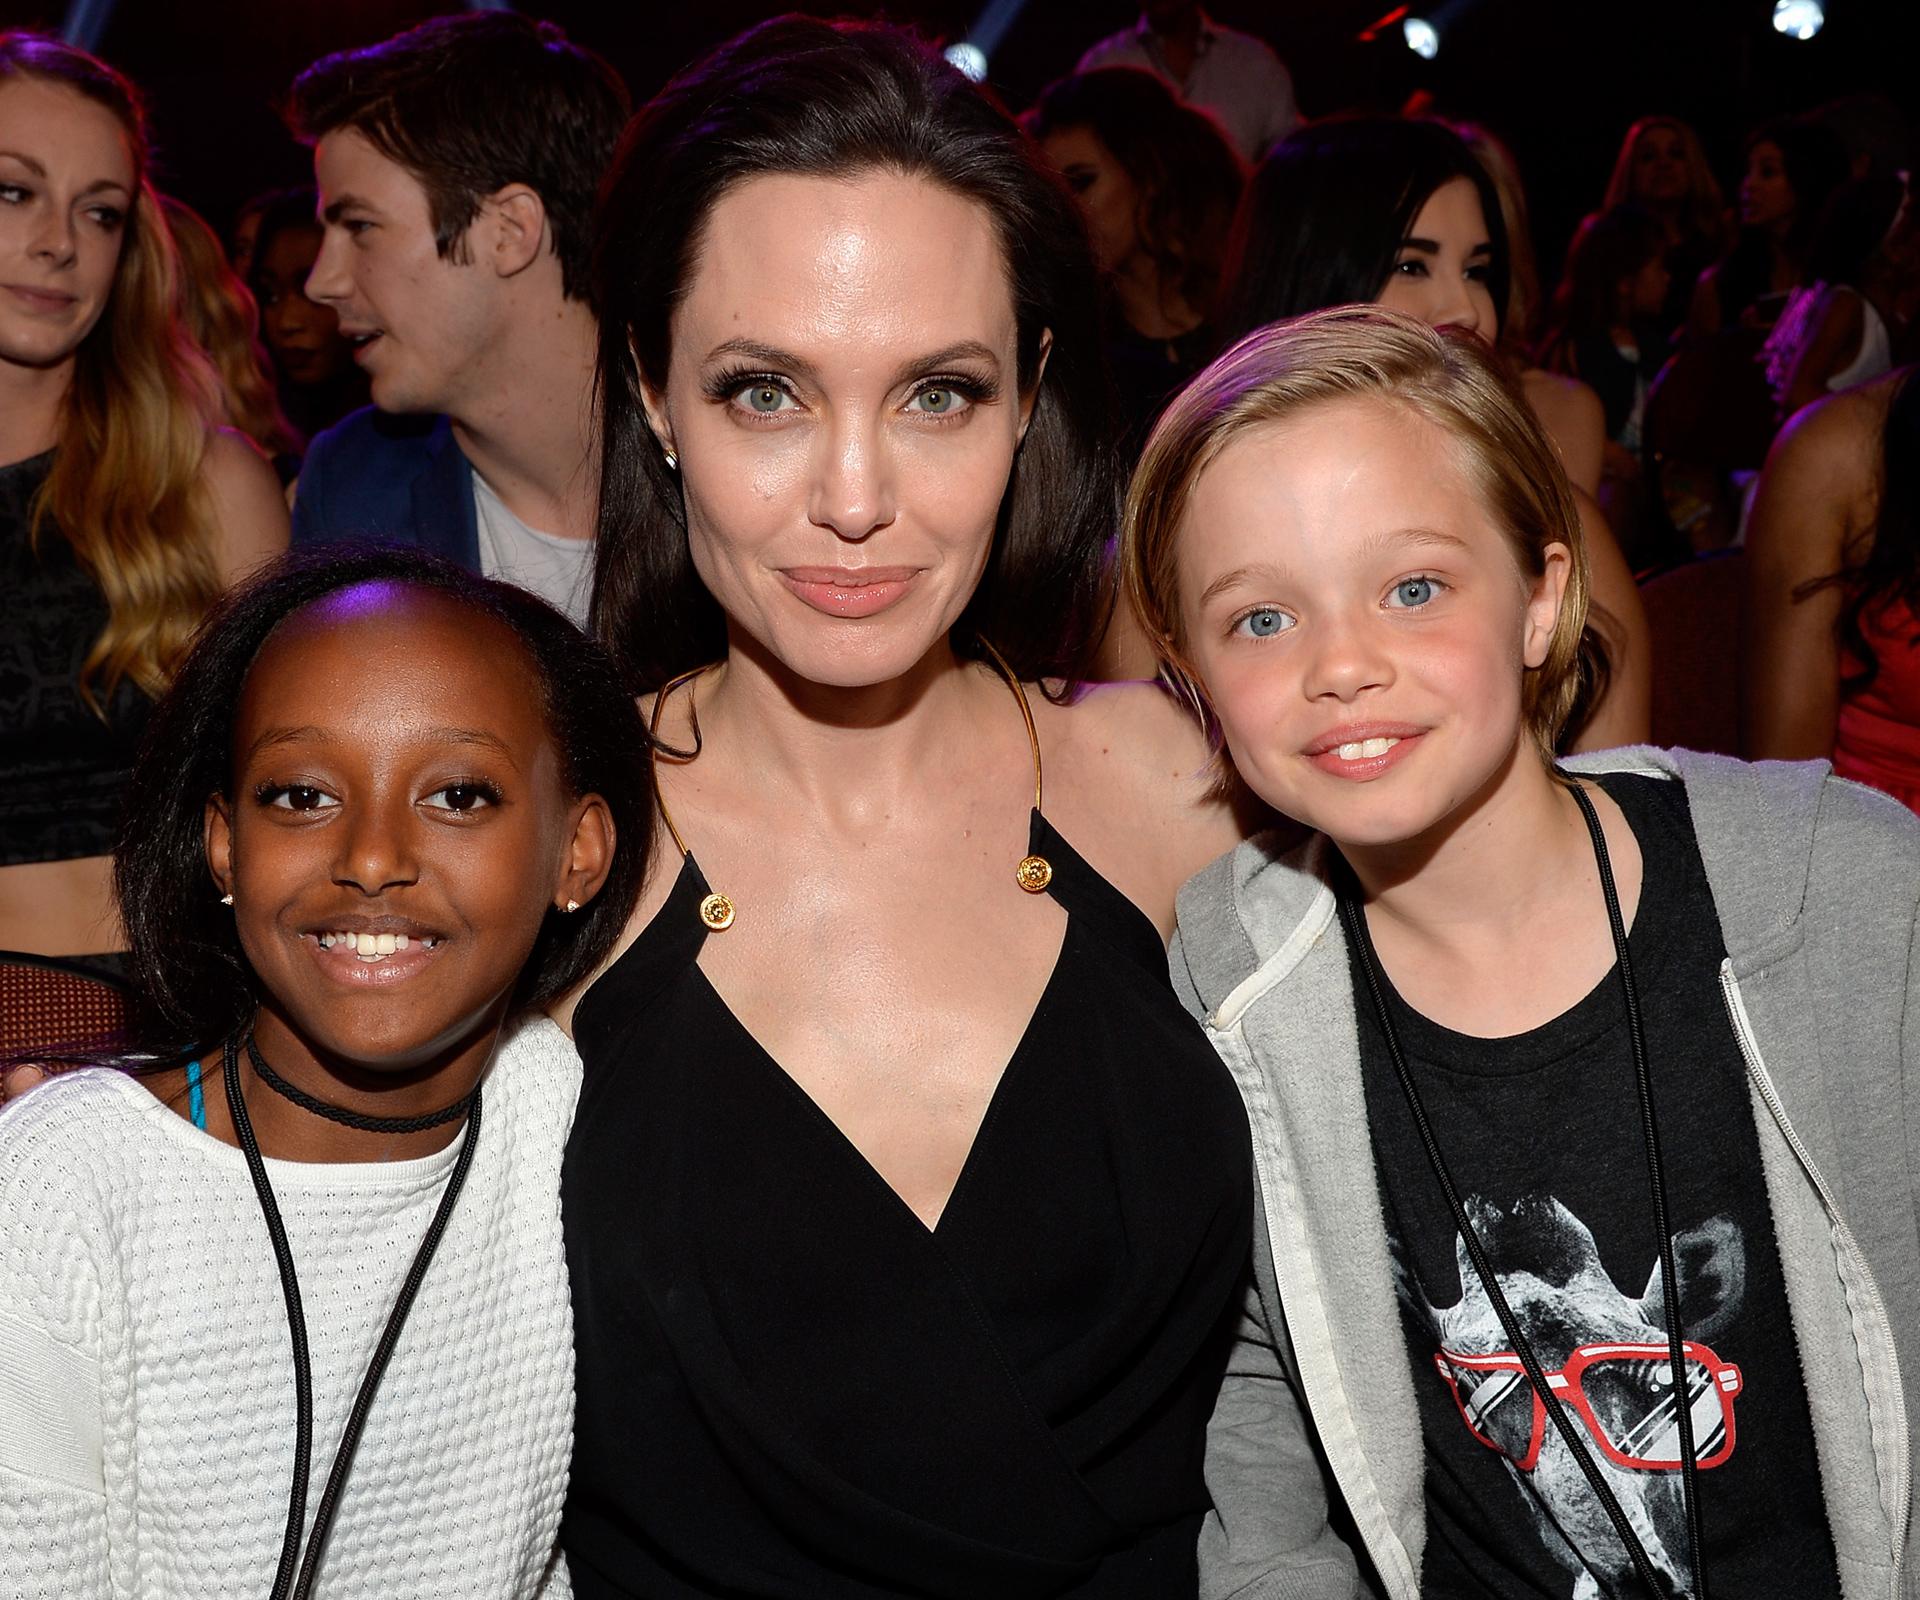 Brad Pitt And Angelina Jolie Kids: Actress Ignoring Children, Focused On Refugees?